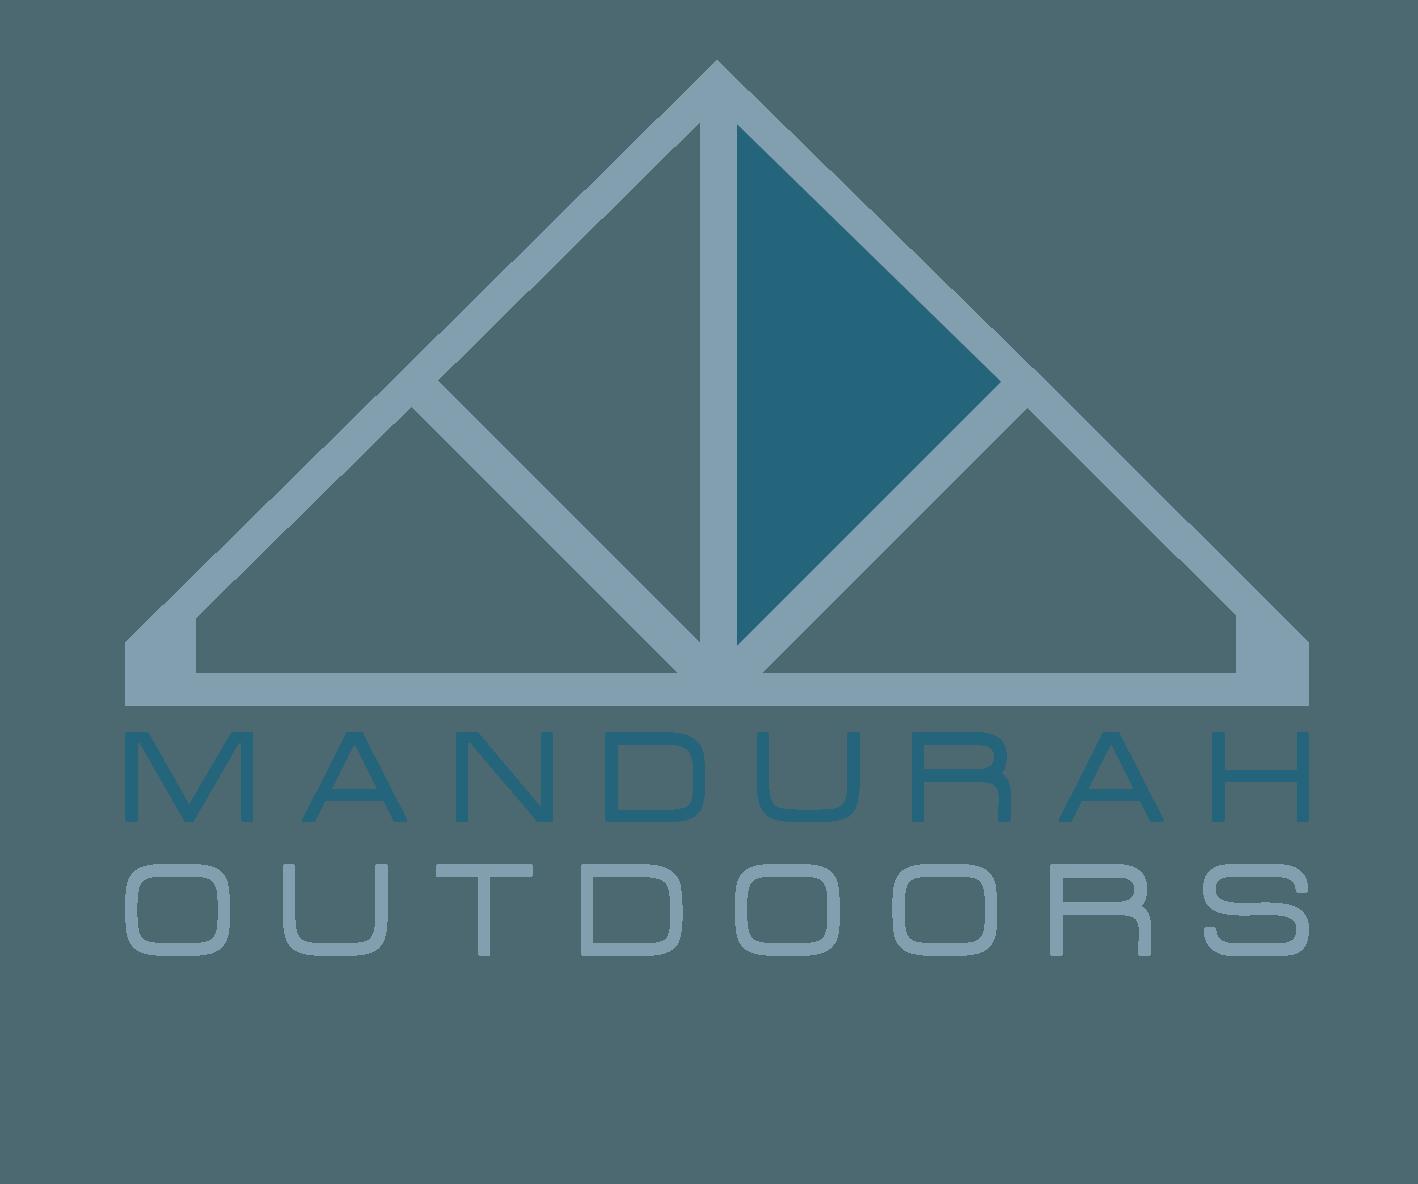 Mandurah Outdoors